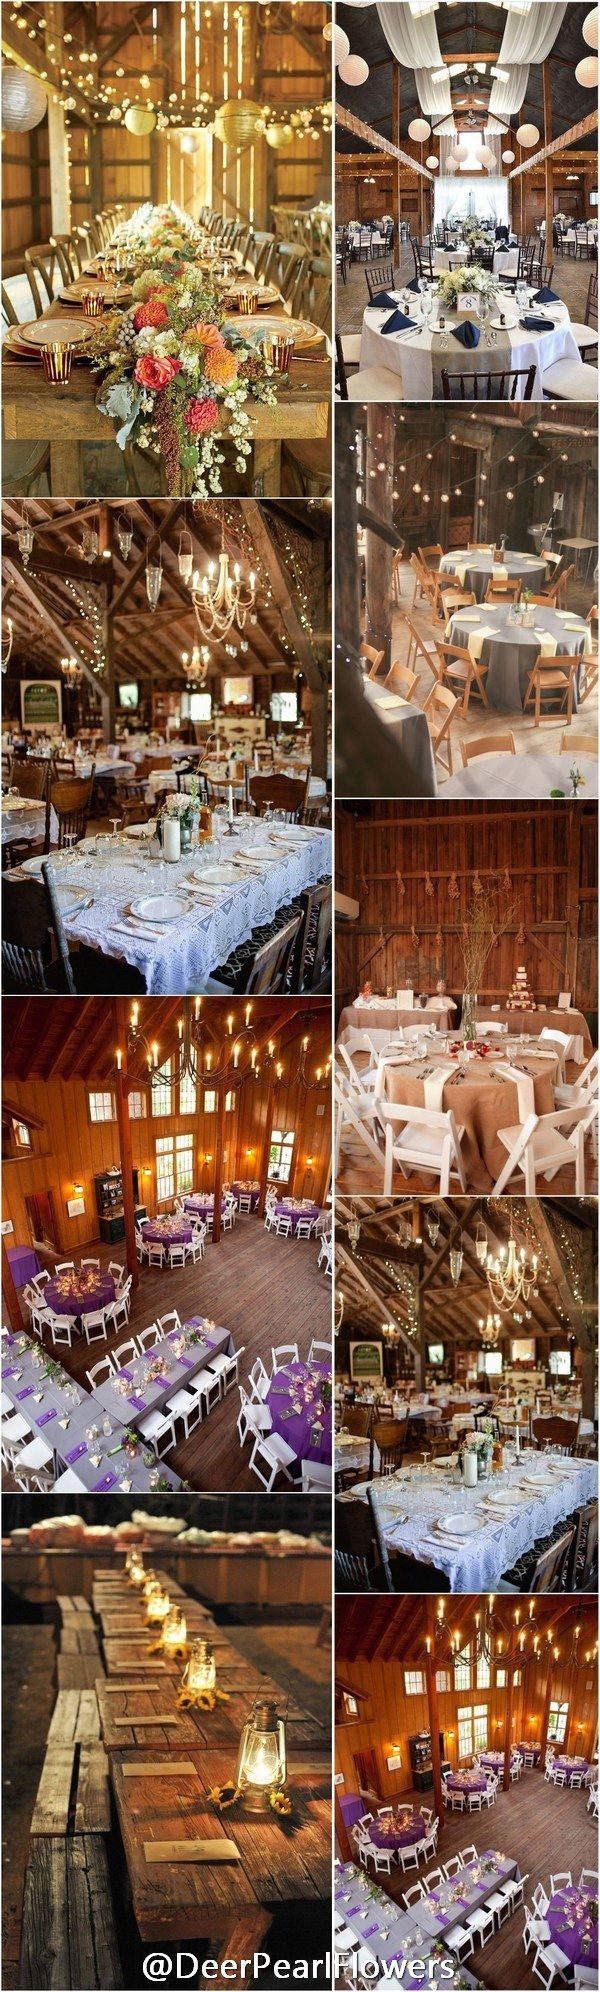 Uncategorized/outdoor vintage glam wedding rustic wedding chic - 30 Barn Wedding Reception Table Decoration Ideas